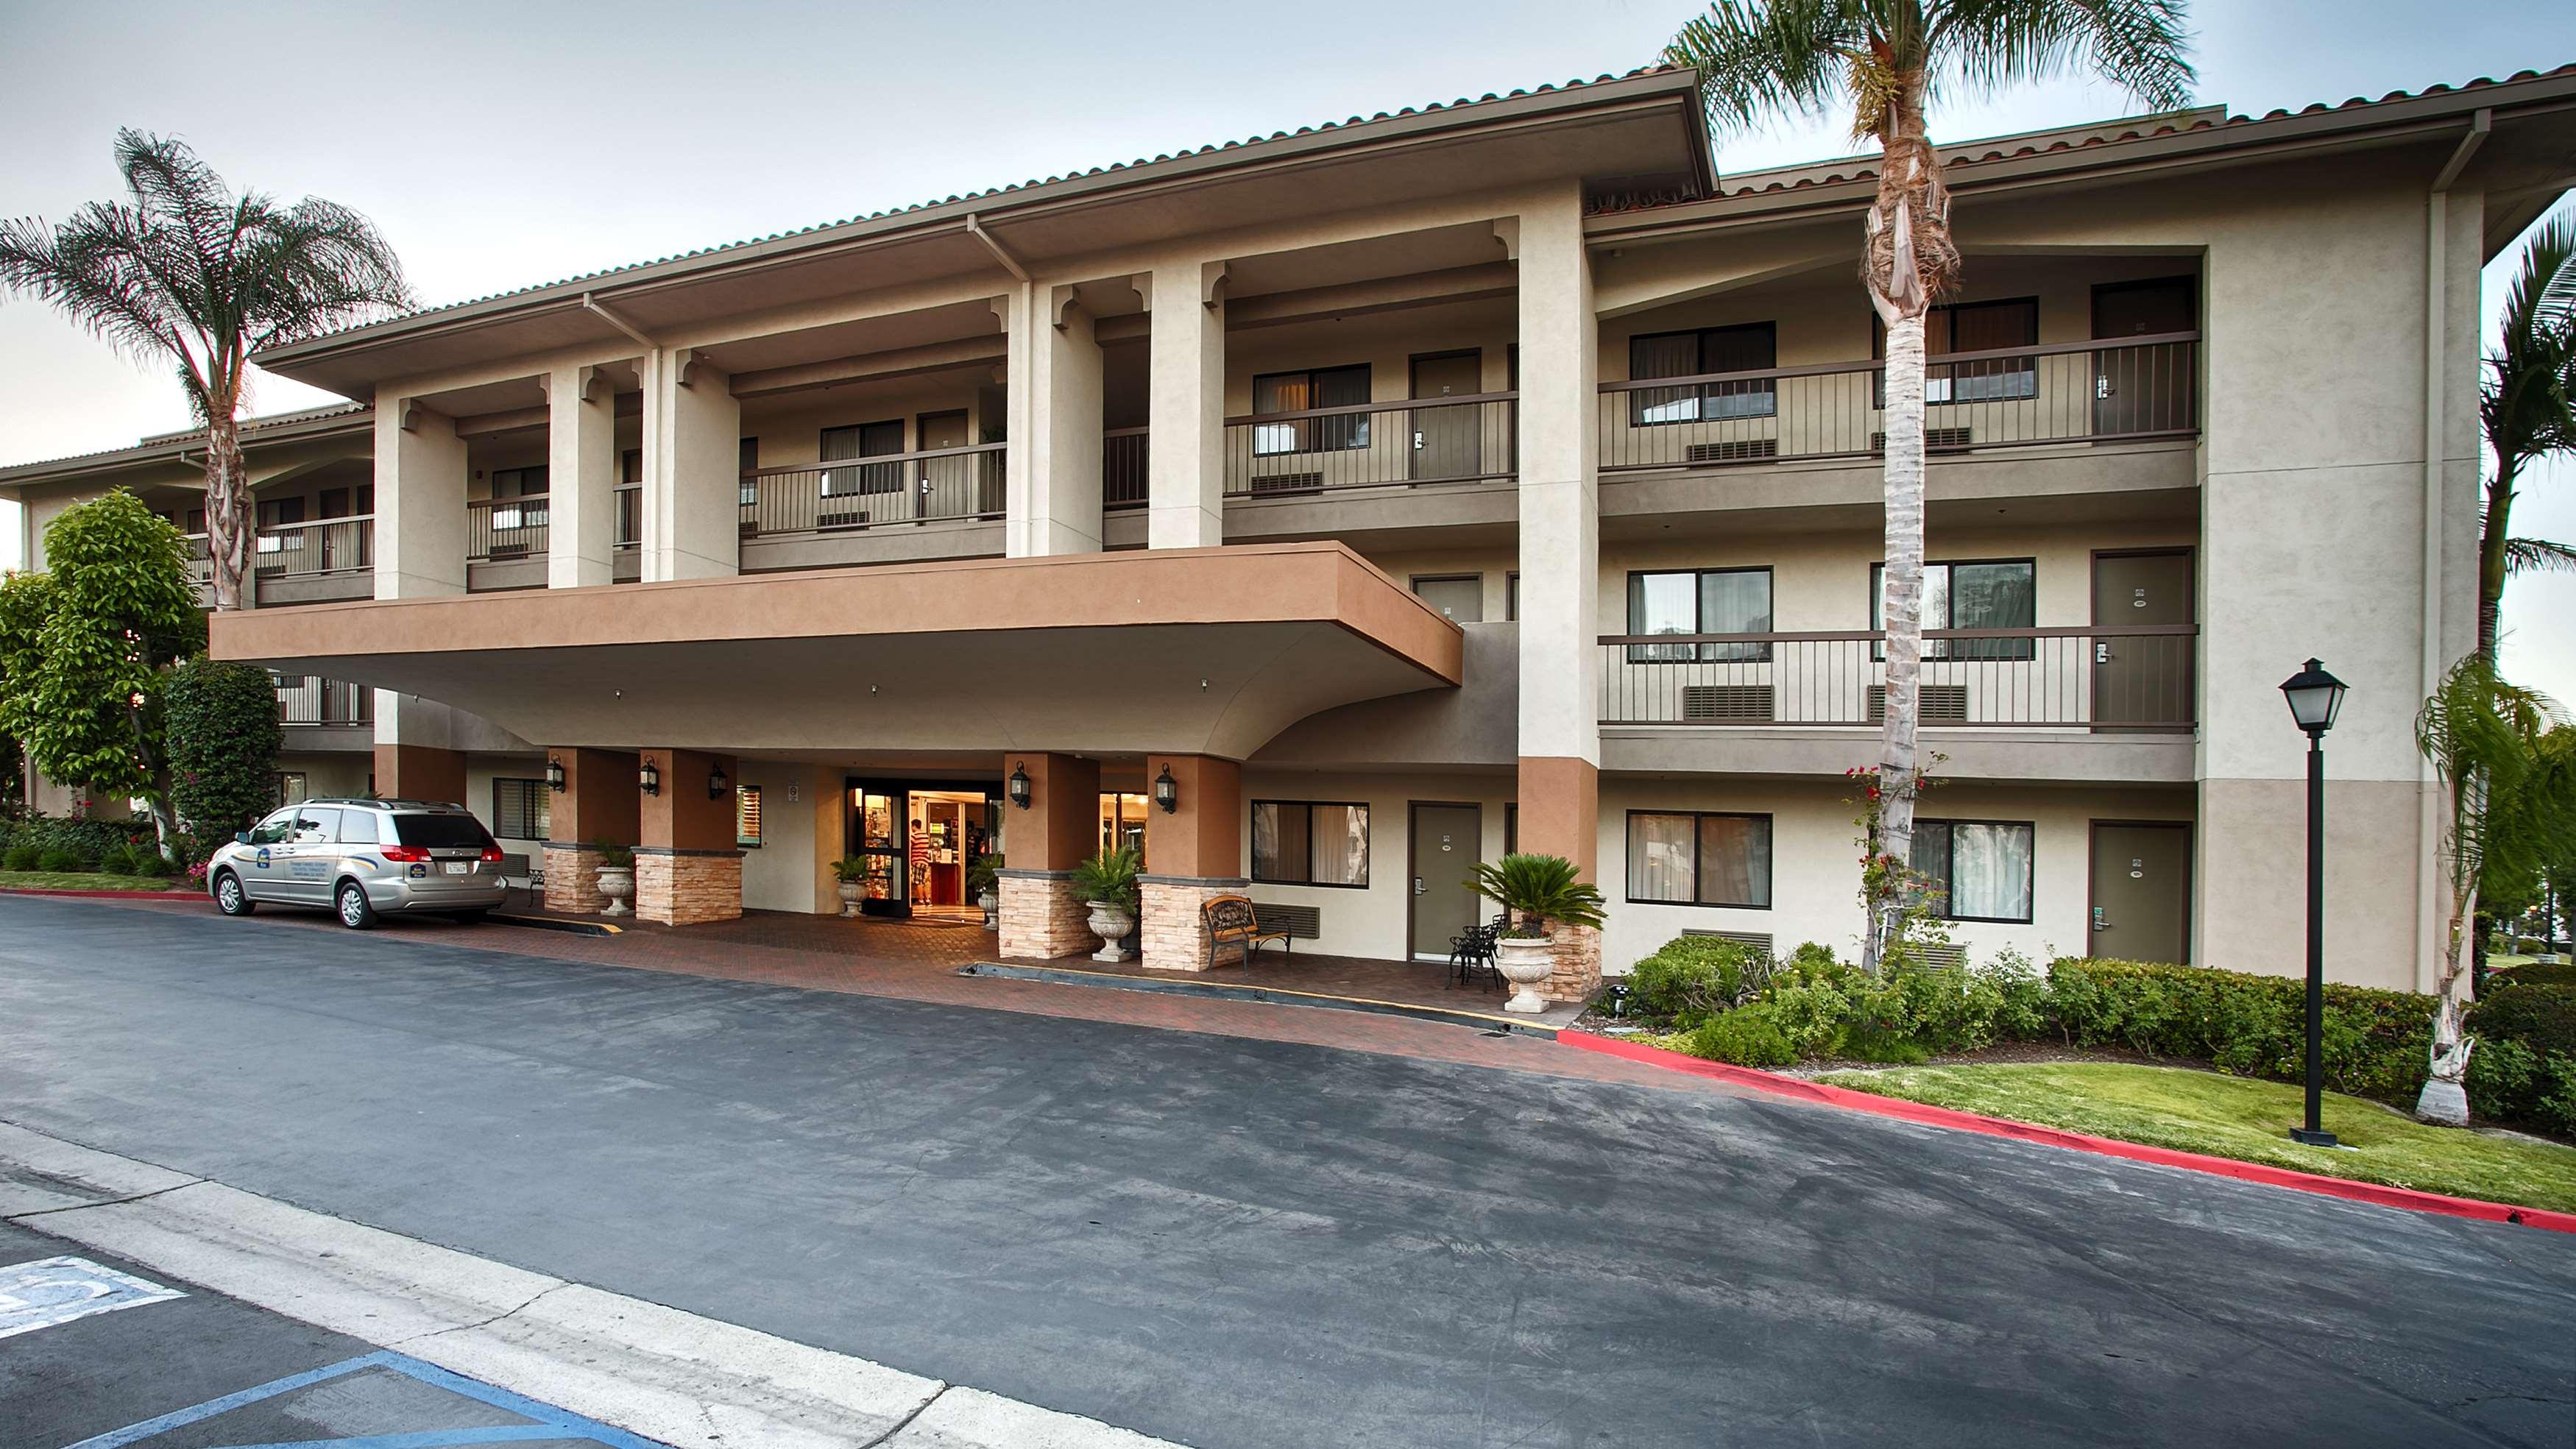 Best western plus orange county airport north 2700 hotel - Maison d architecte orange county californie ...